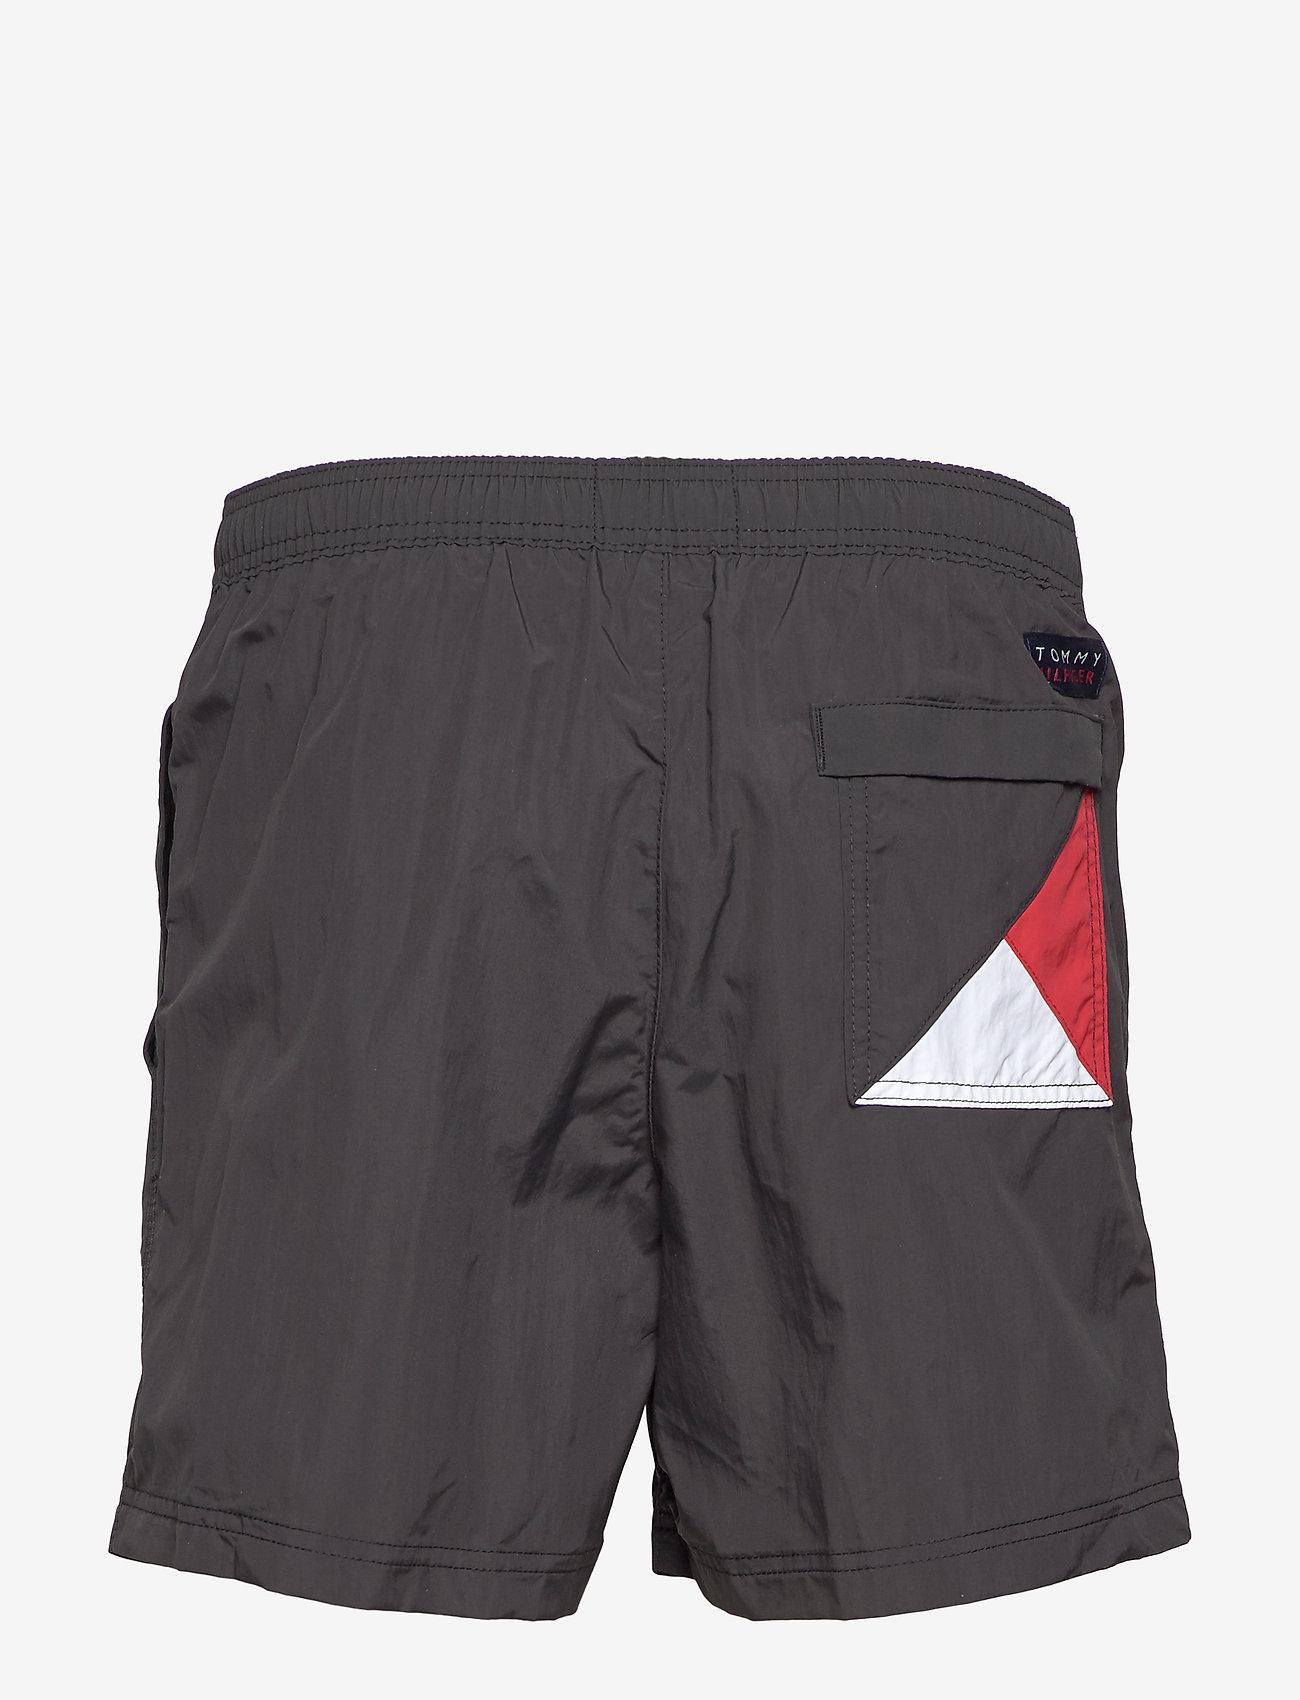 Tommy Hilfiger - SF MEDIUM DRAWSTRING - swim shorts - pvh black - 1